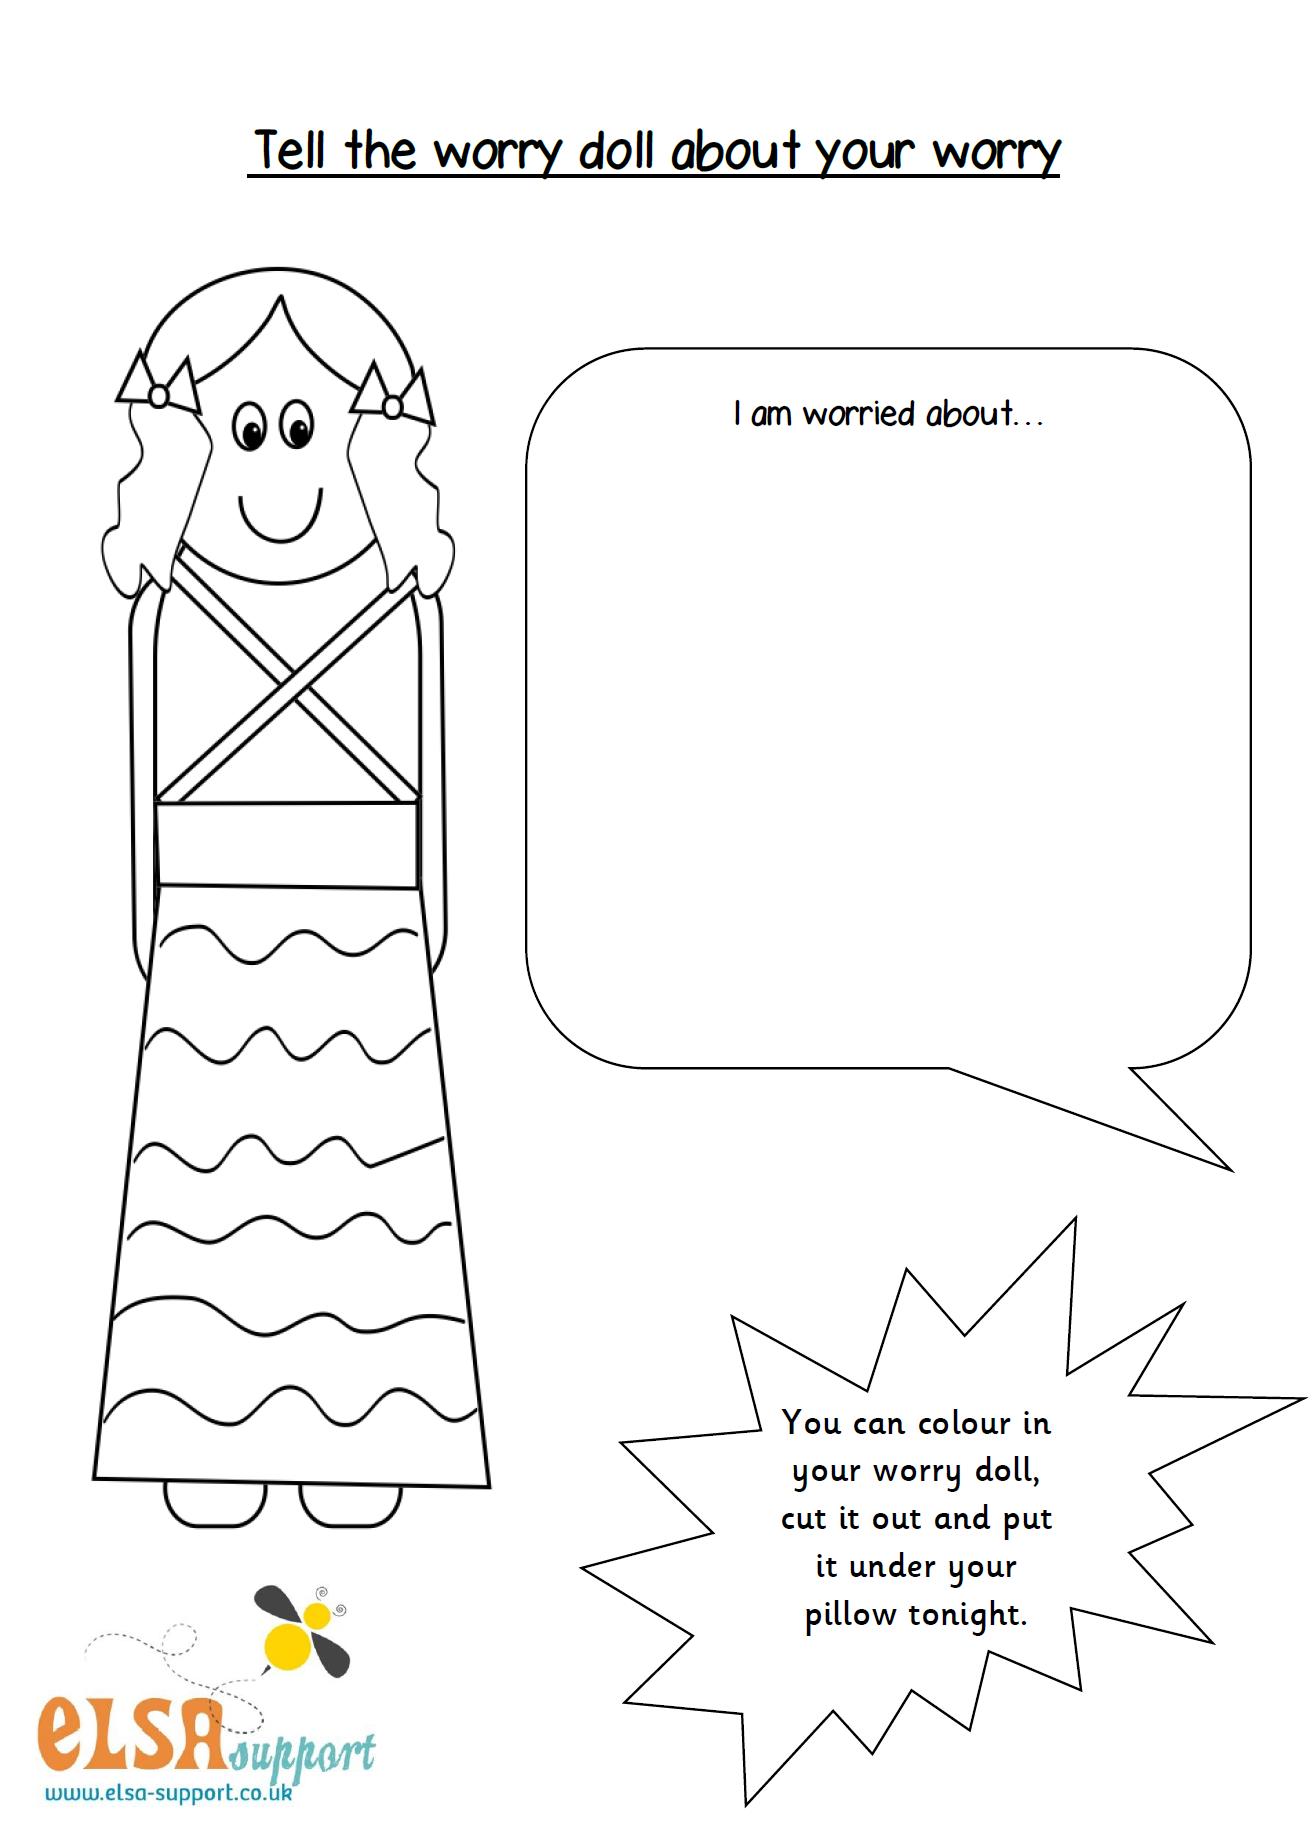 worksheet Anxiety Worksheet worry doll worksheet emotional intelligence pinterest worksheet